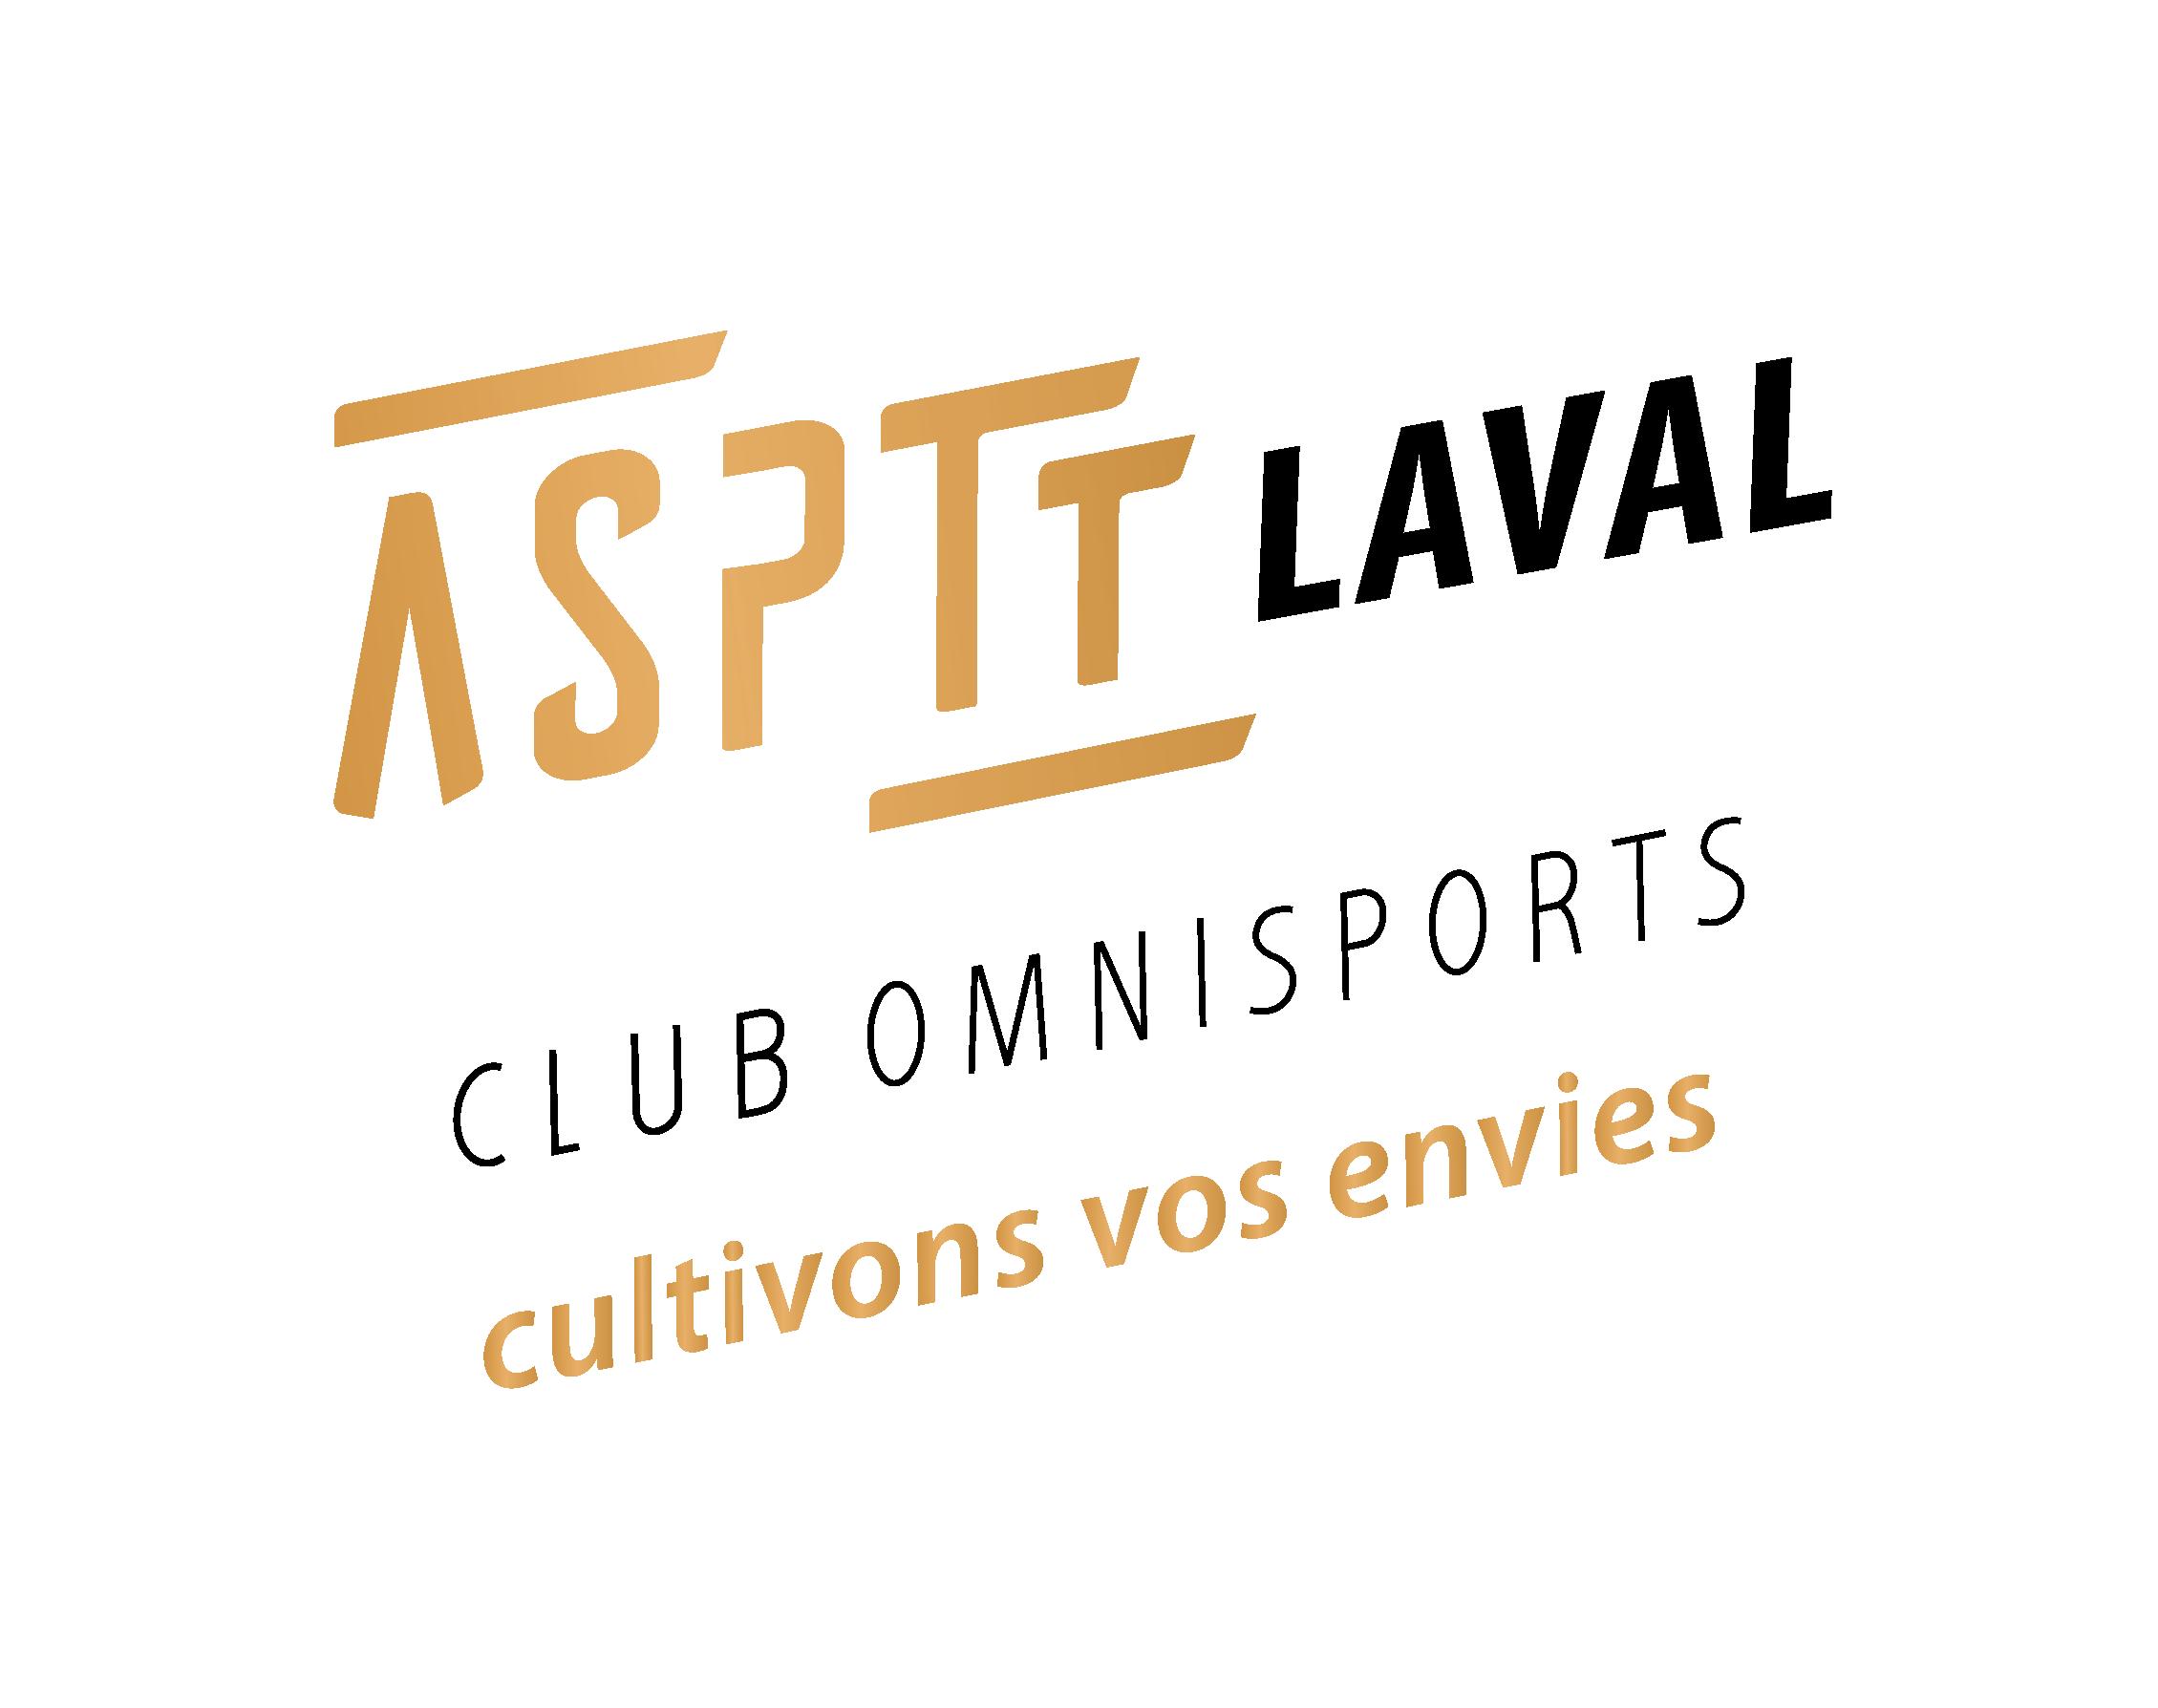 ASPTT Laval - Votre Club Omnisports - 1 CLUB 12 ACTIVITES